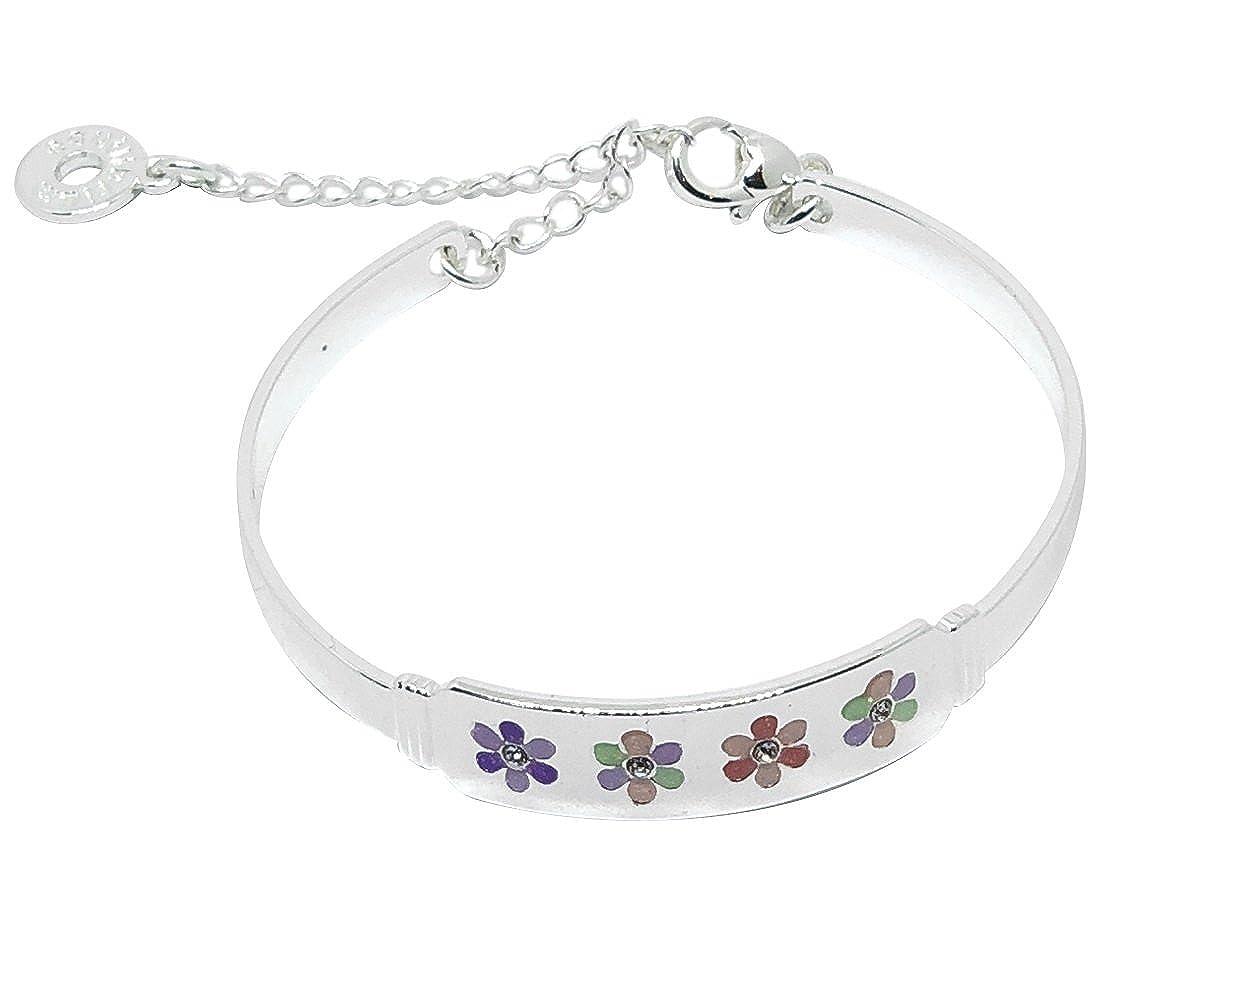 Mirabella BellaMira Girls Flower Princess Rhinestone Bangle Bracelet Fine Jewellery Gift Boxed